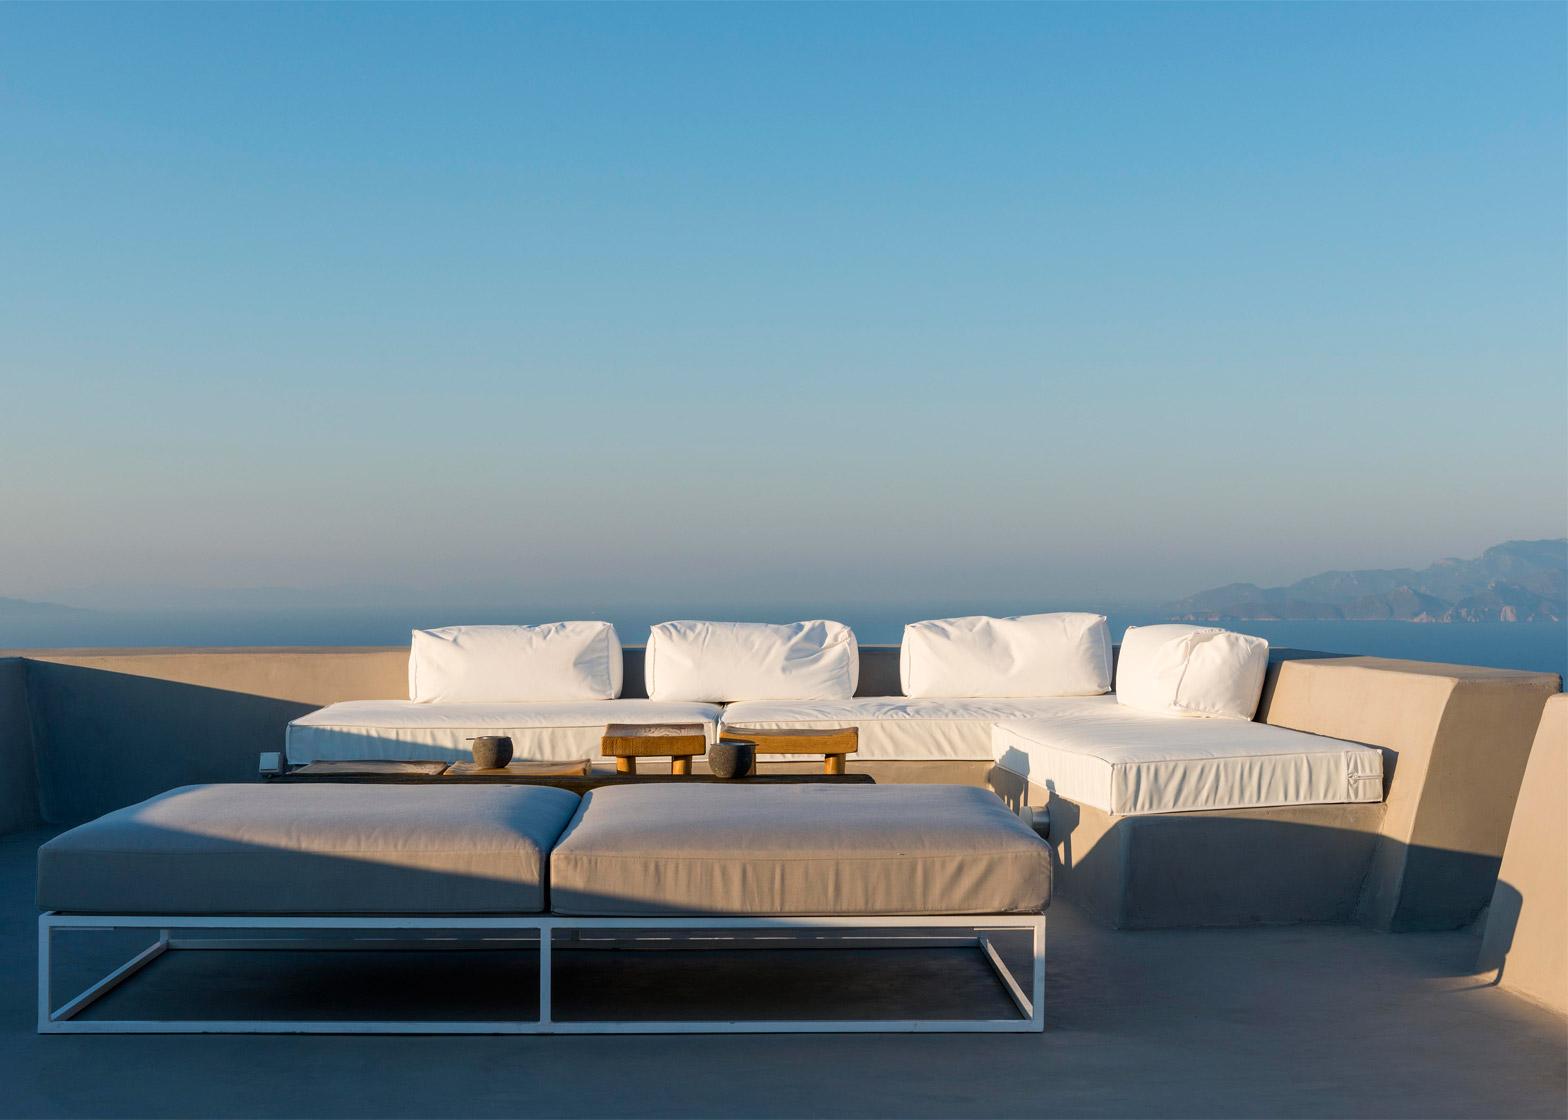 Sterna Nisyros Residences by Greg Haji Joannides